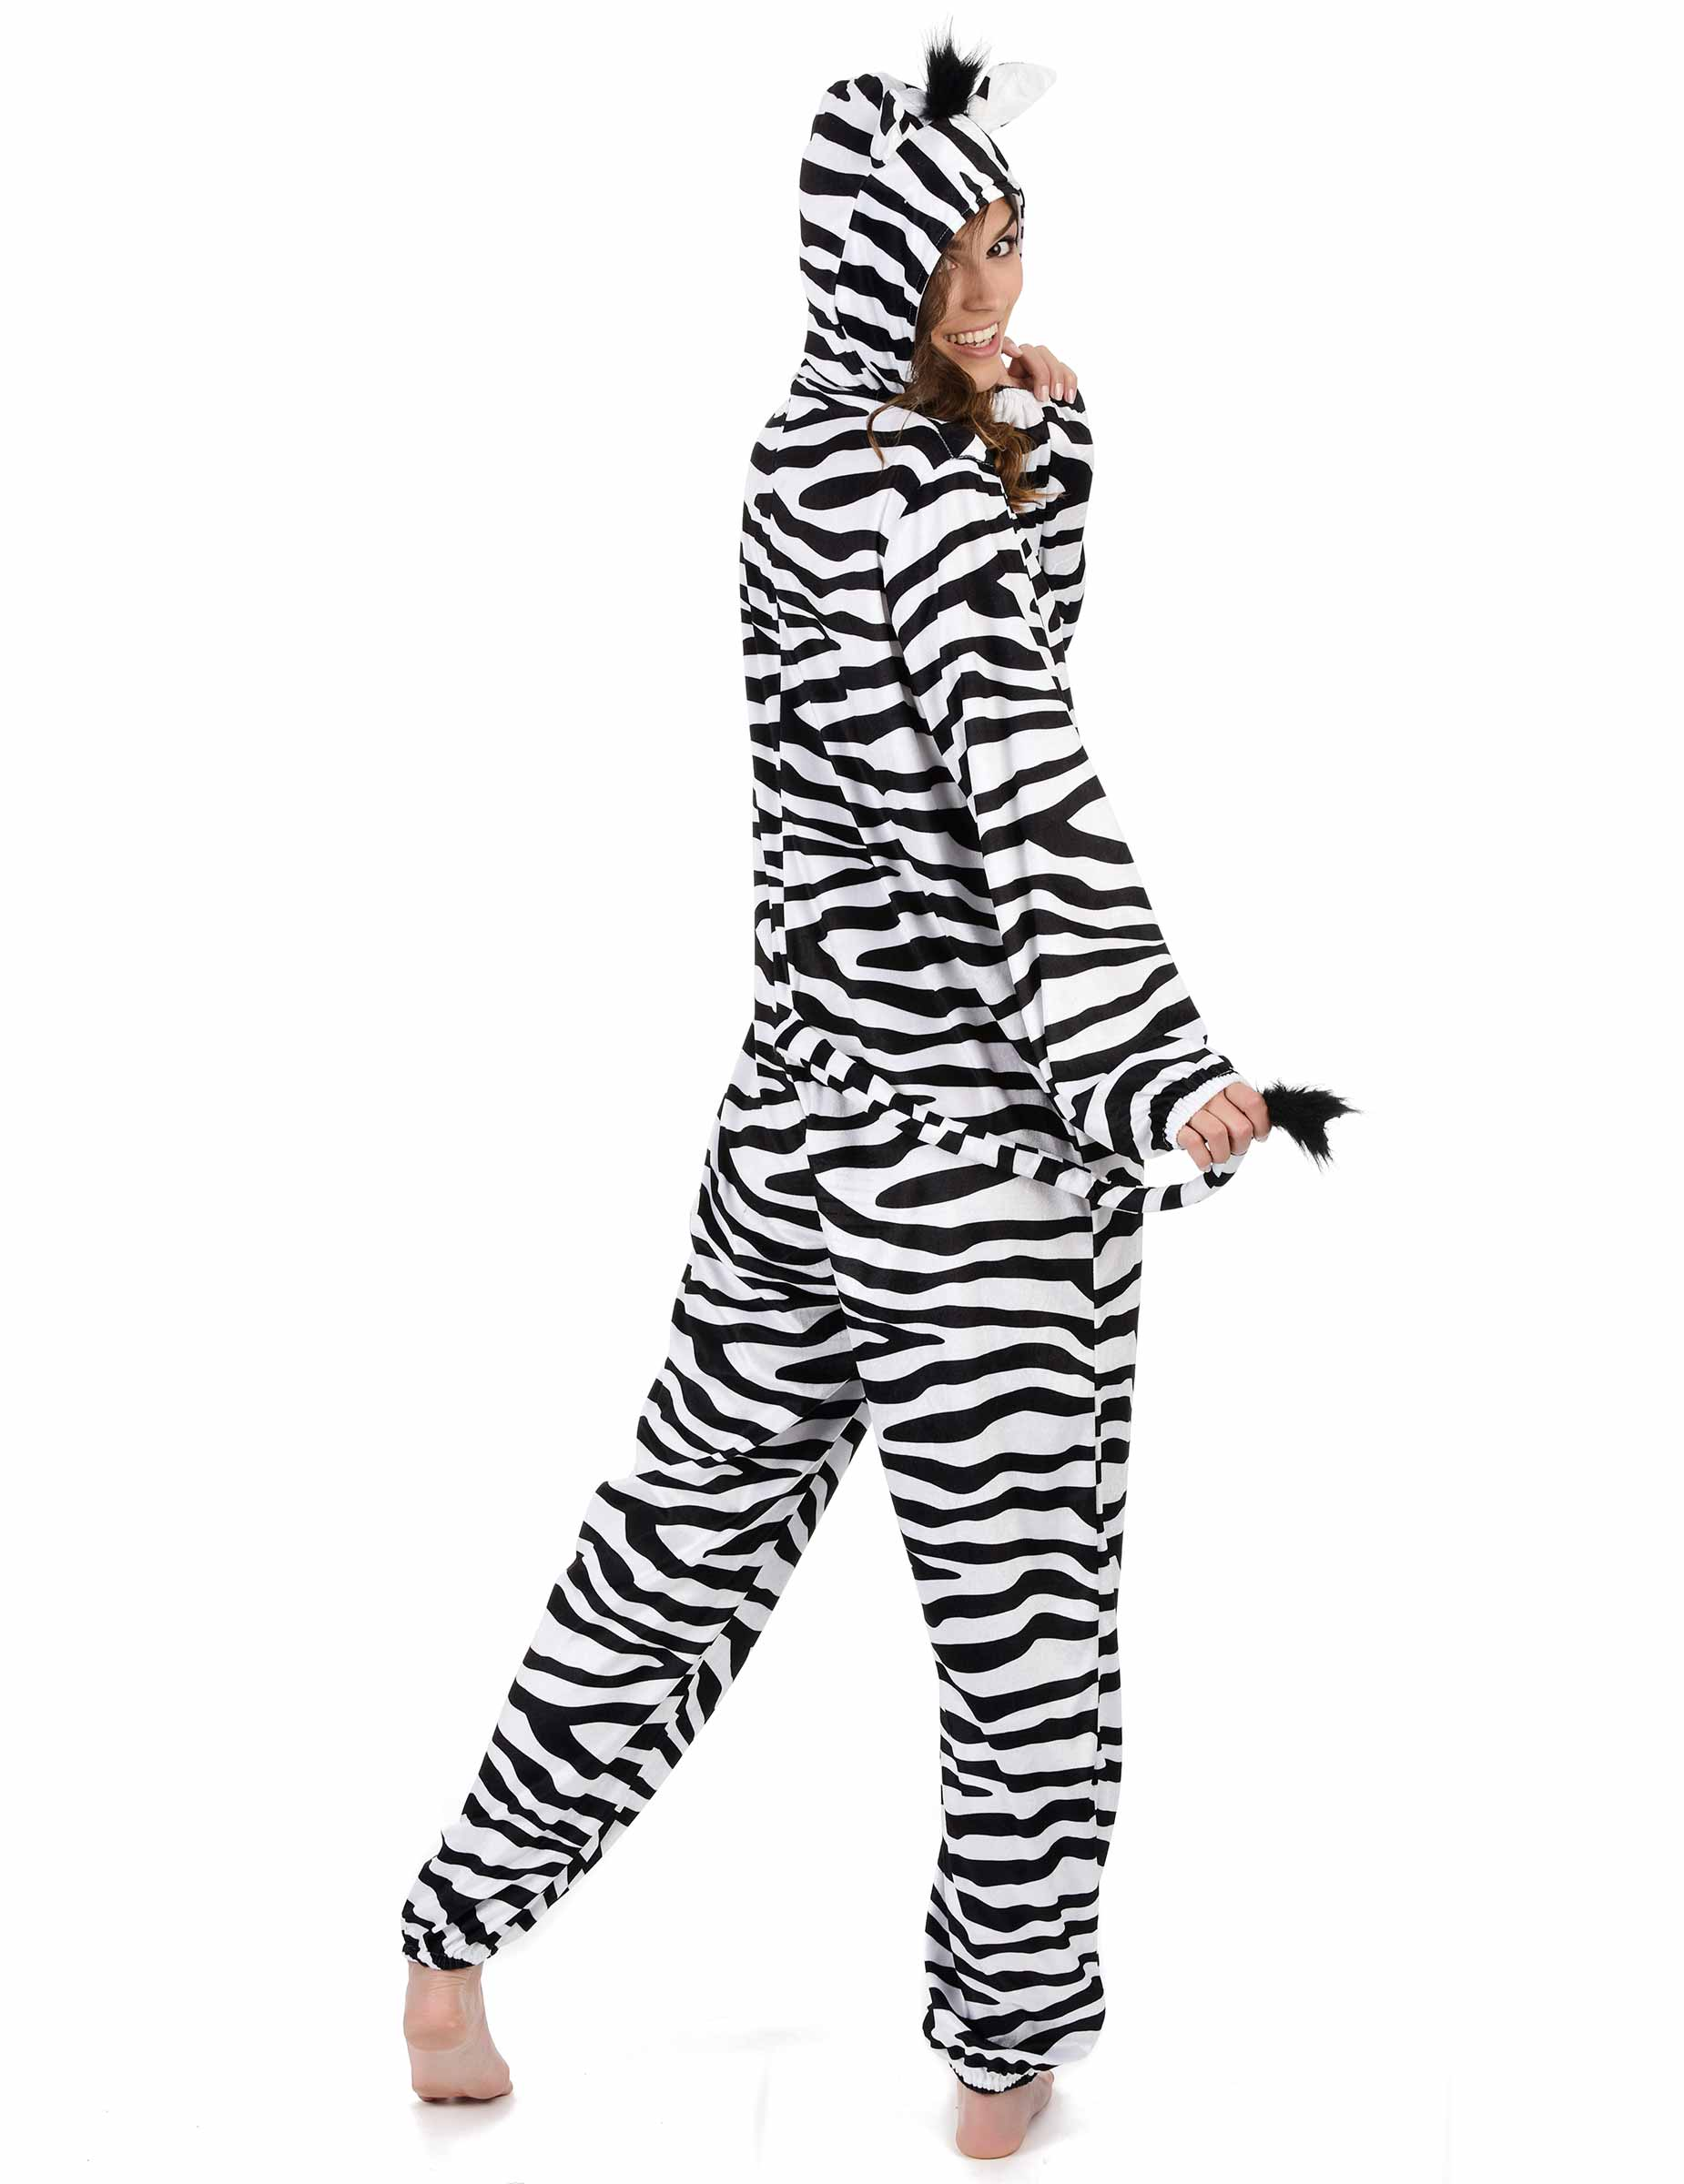 Top Inspirasi 44 Kostum Zebra